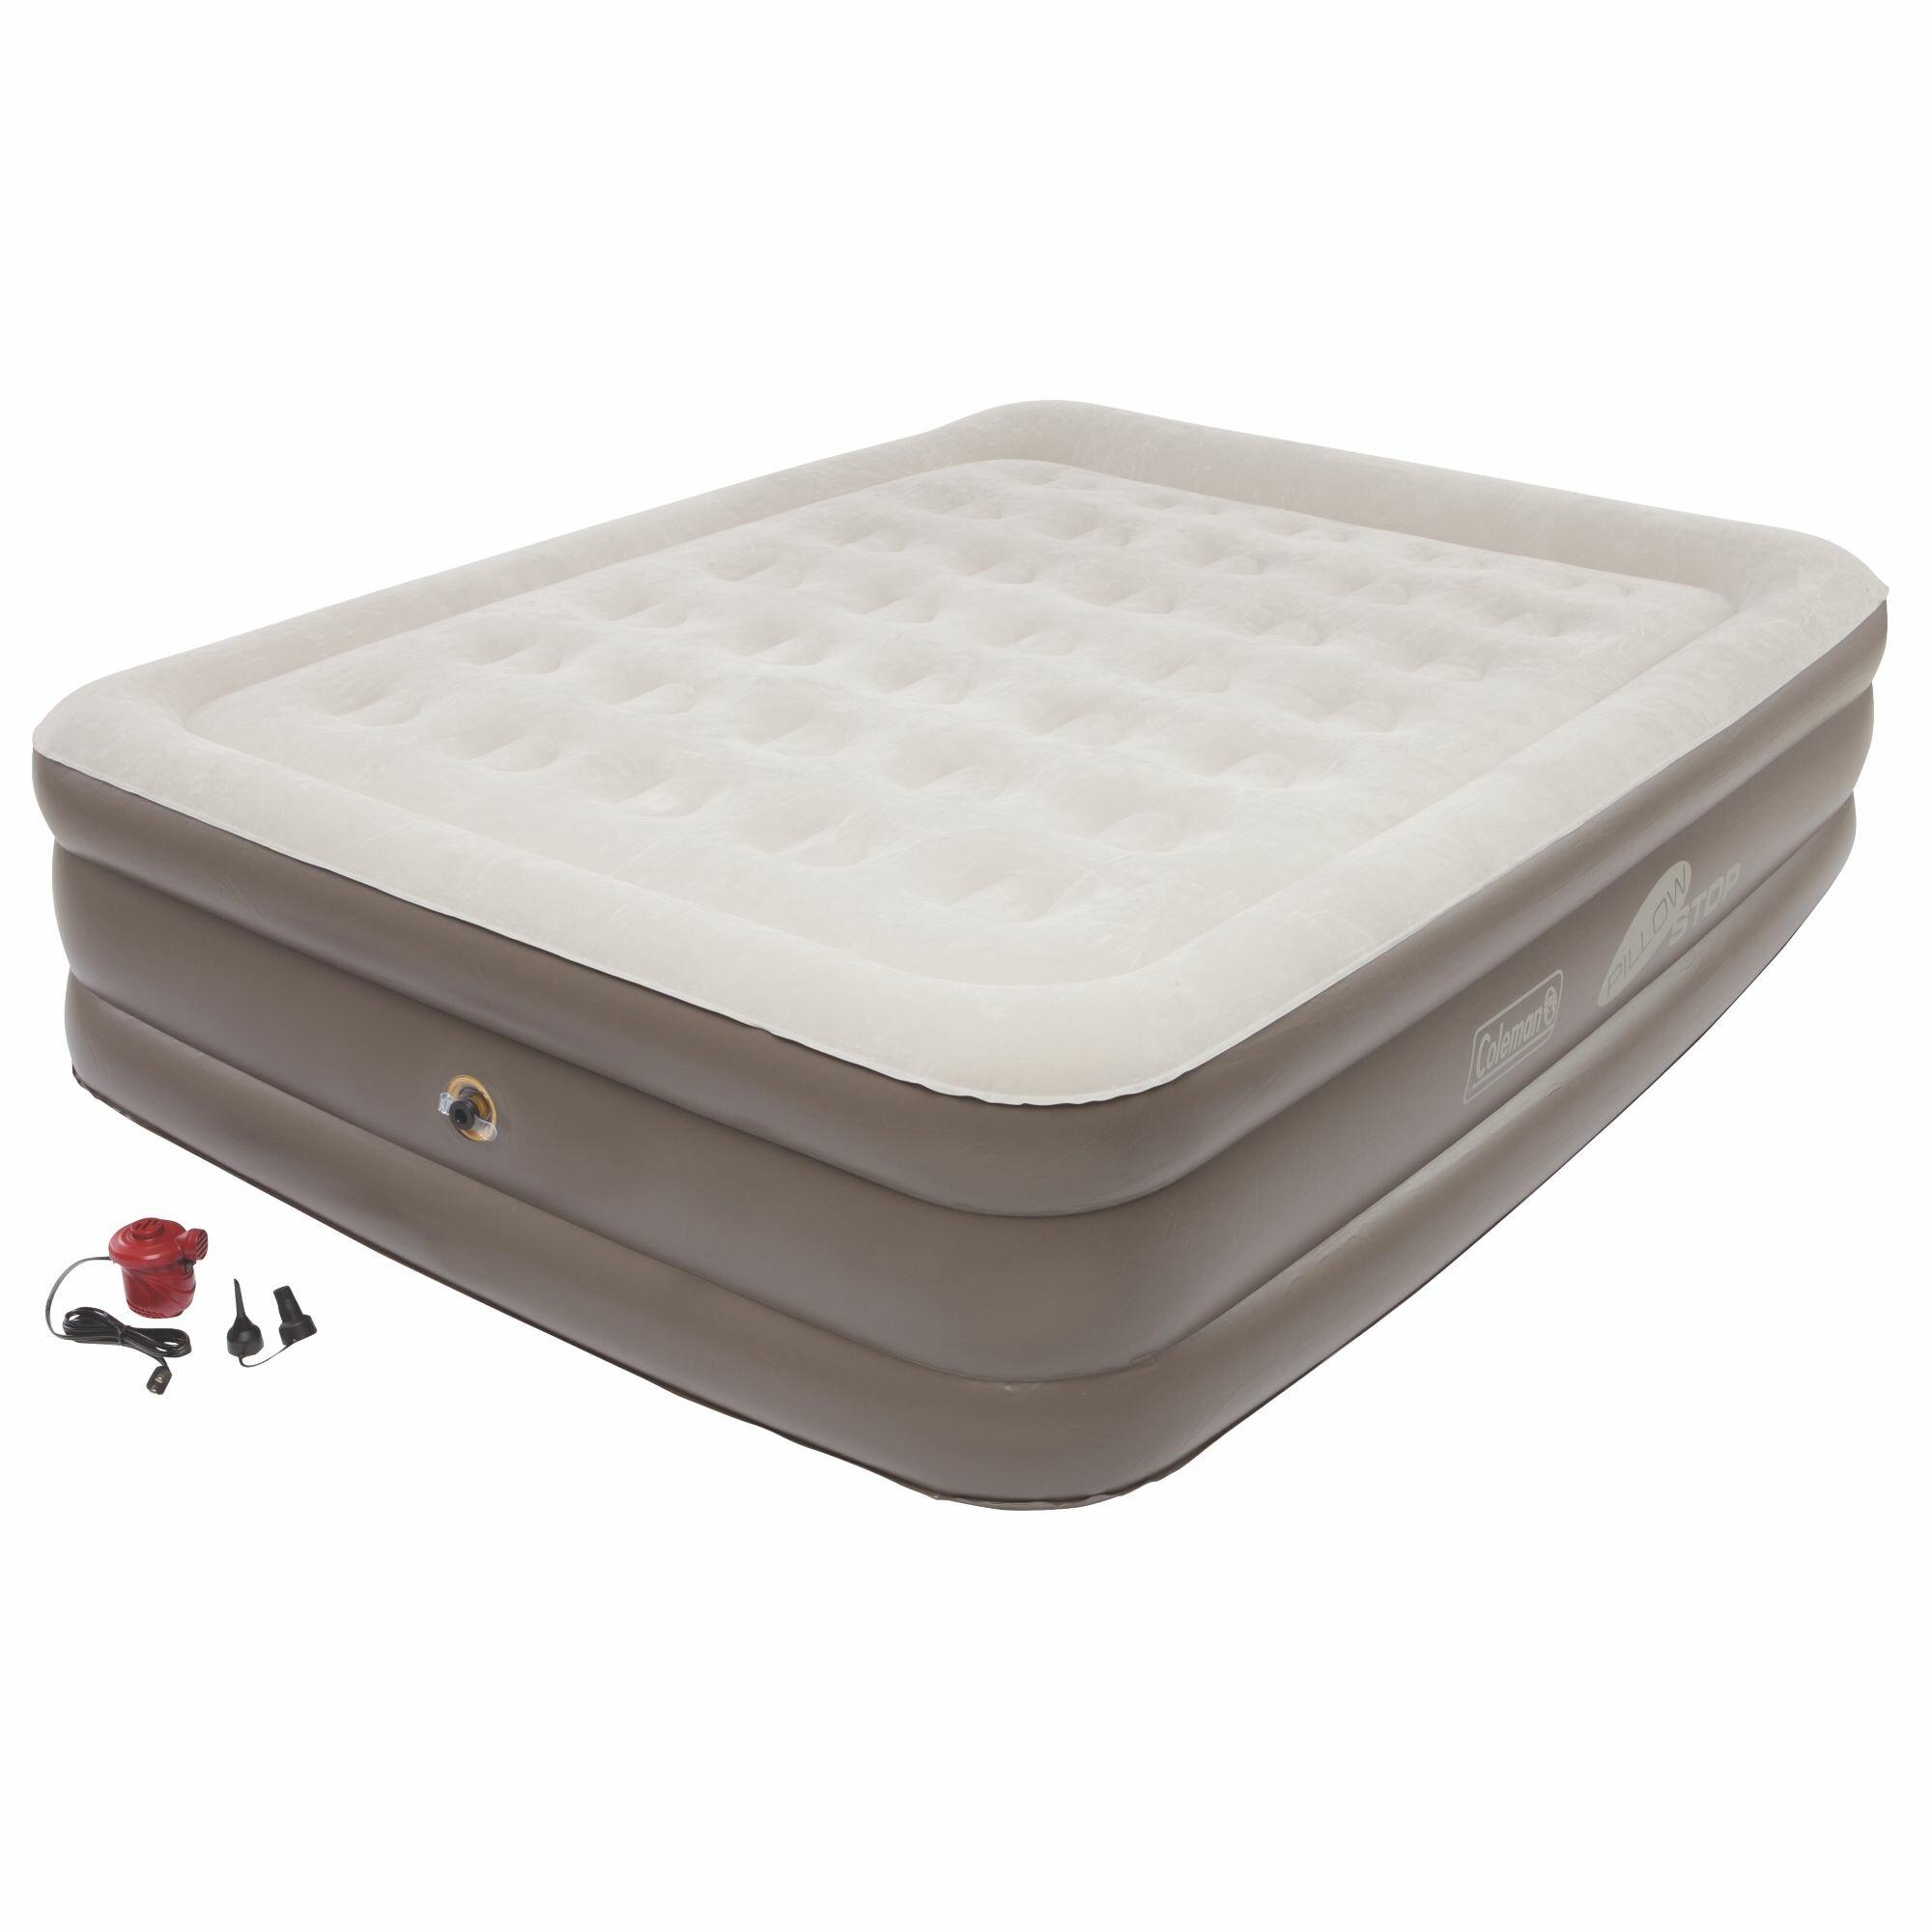 camping id quechua comfort mattress air arpenaz inflatable